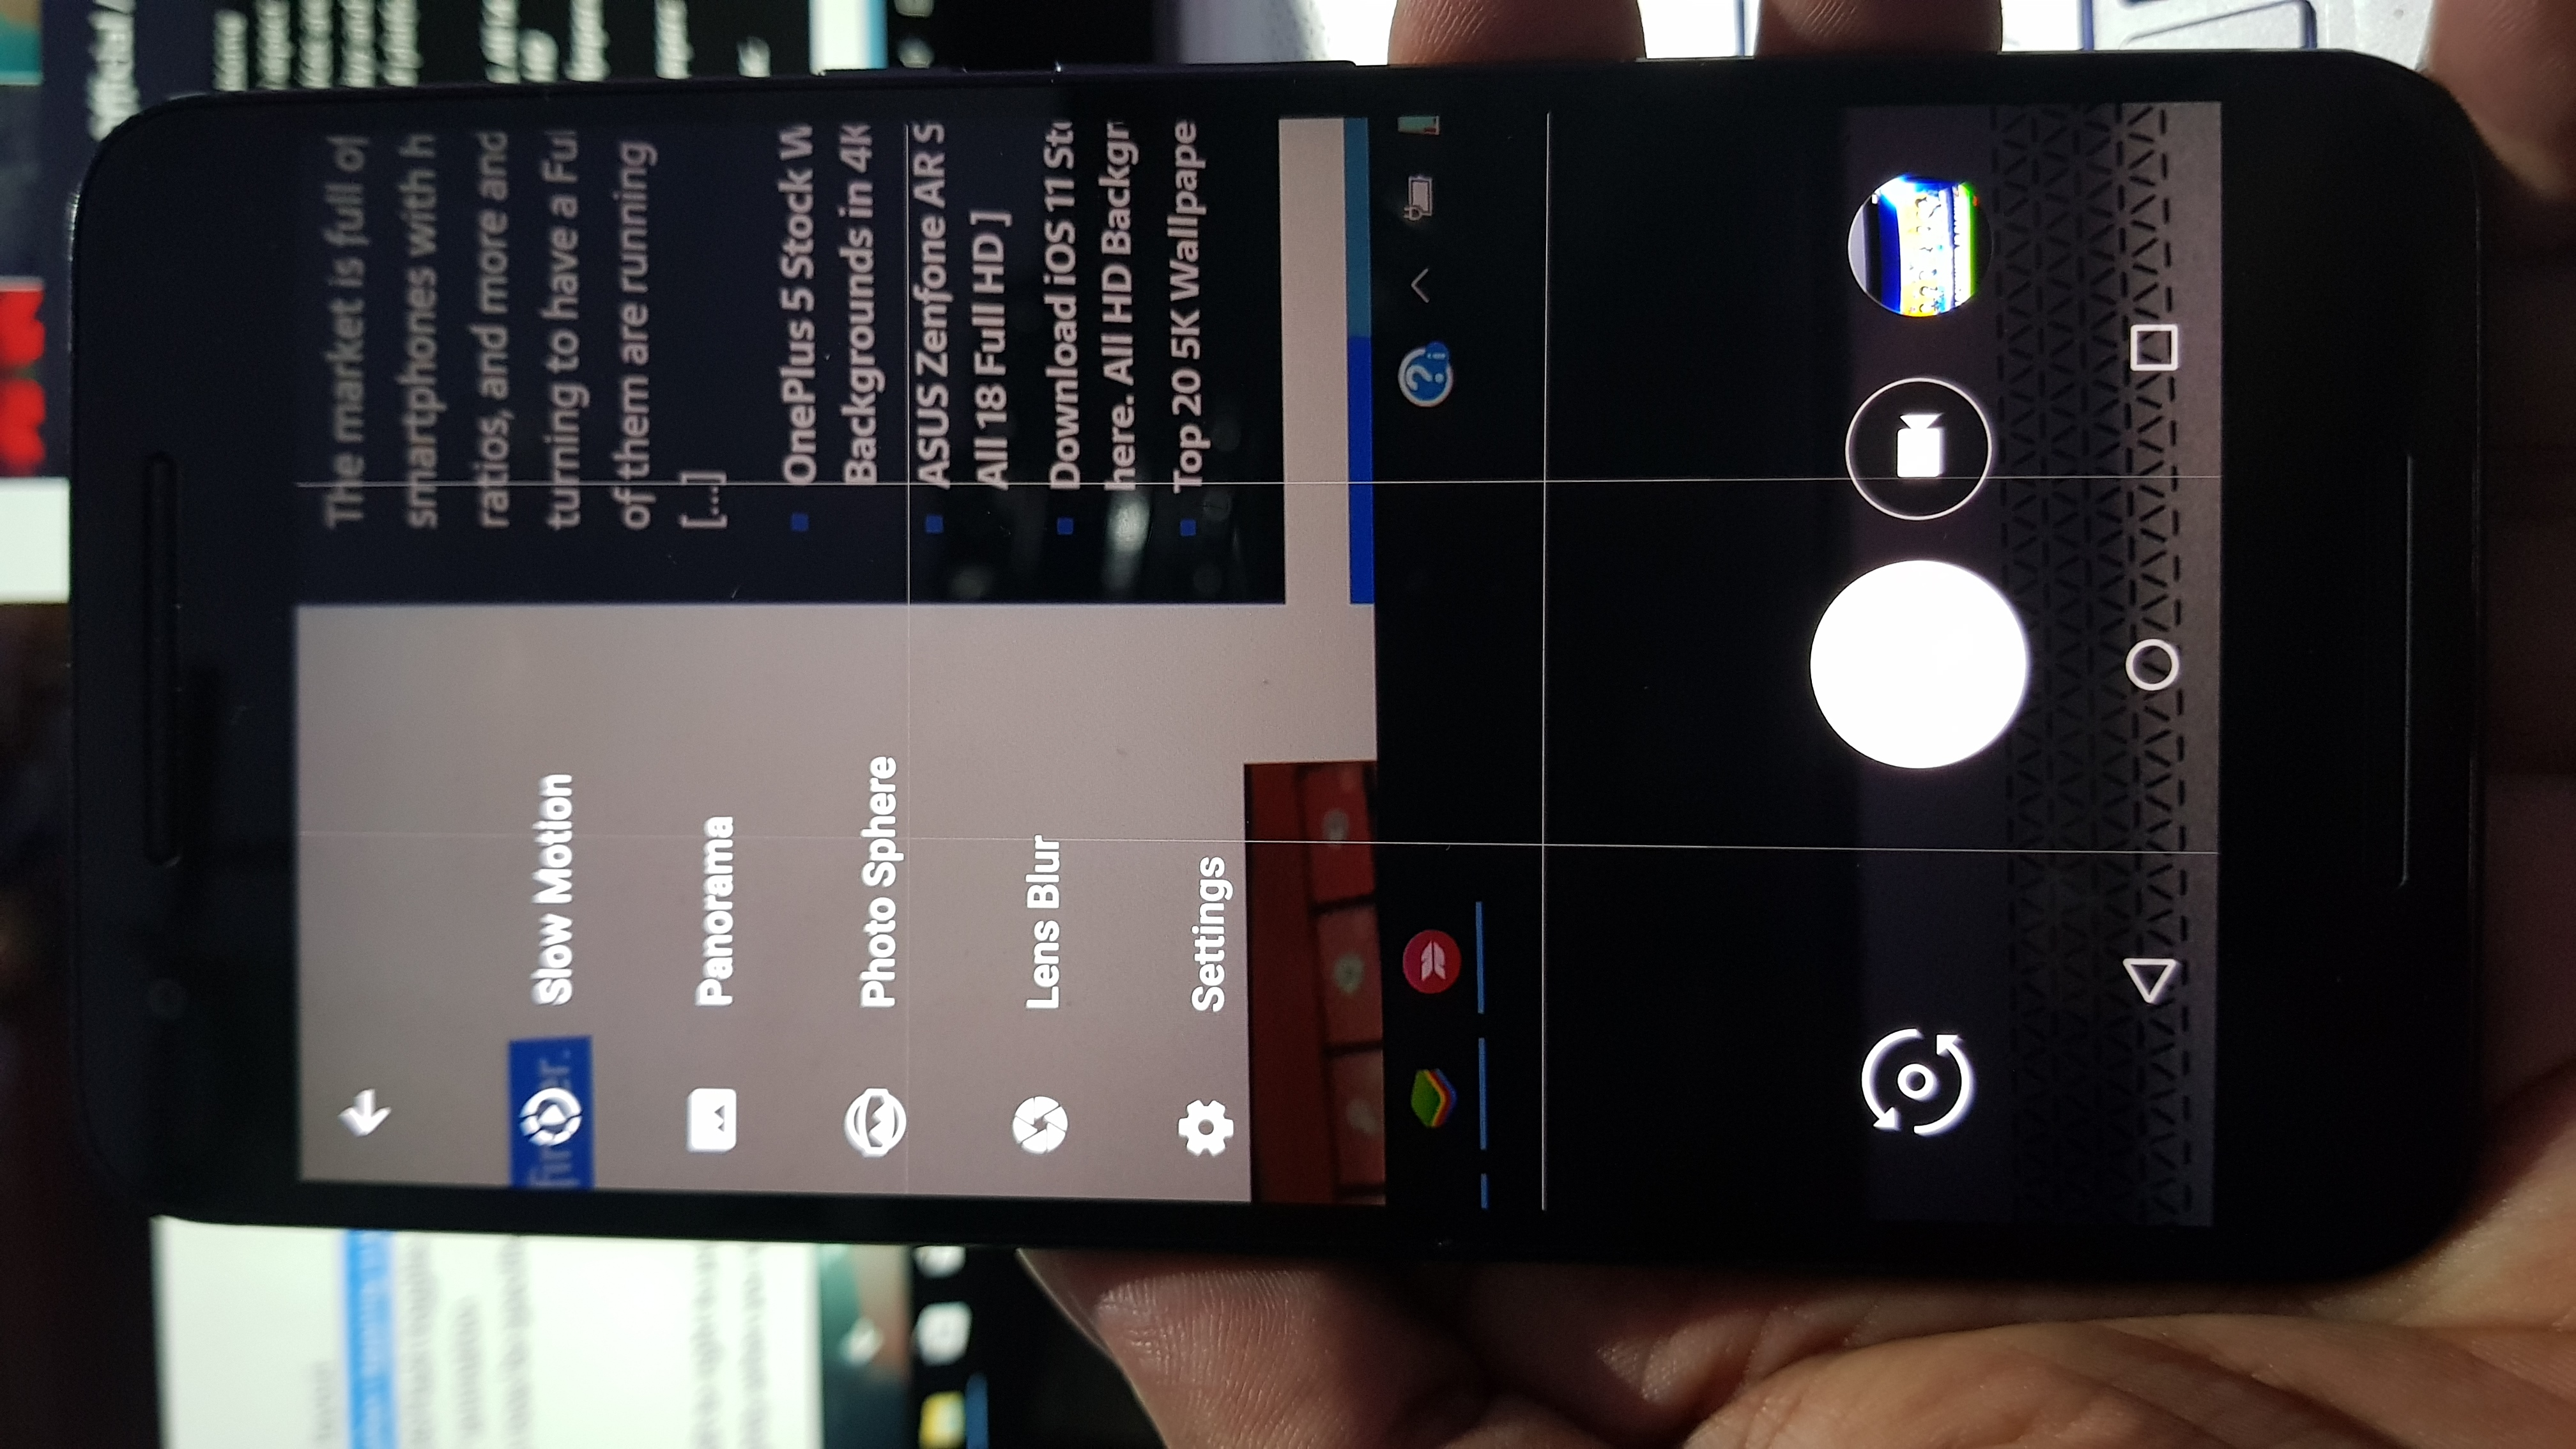 Google-Camera-4.4-Apk-Android-8-Orio (1)